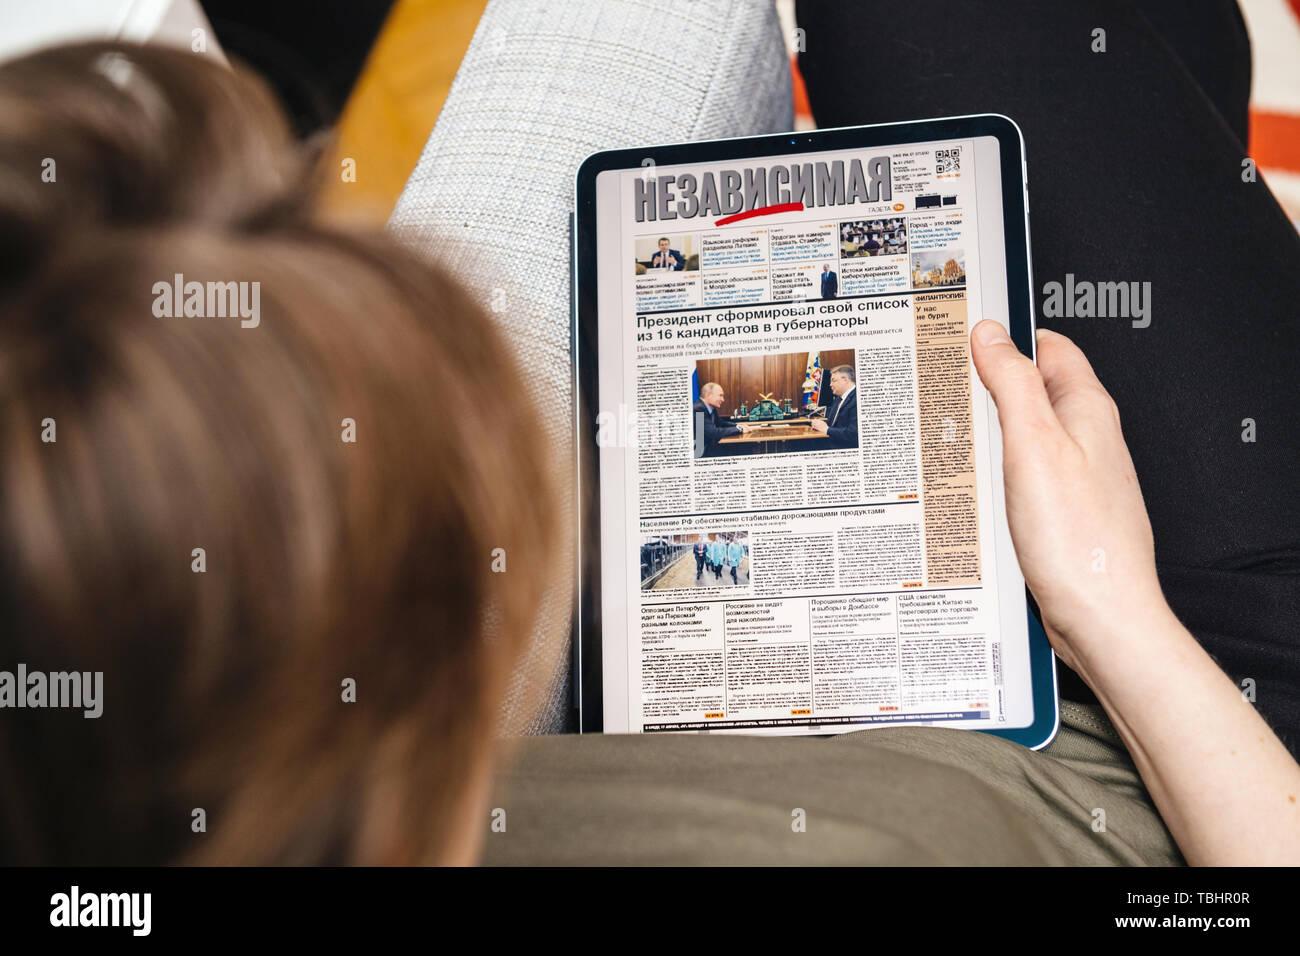 Paris, France - Apr 15, 2019: Woman reading on iPad Pro Apple News Plus Nezavisimaya Gazeta digital newspaper featuring breaking neabout 16 governors list made by Vladimir Putin Russian President - Stock Image